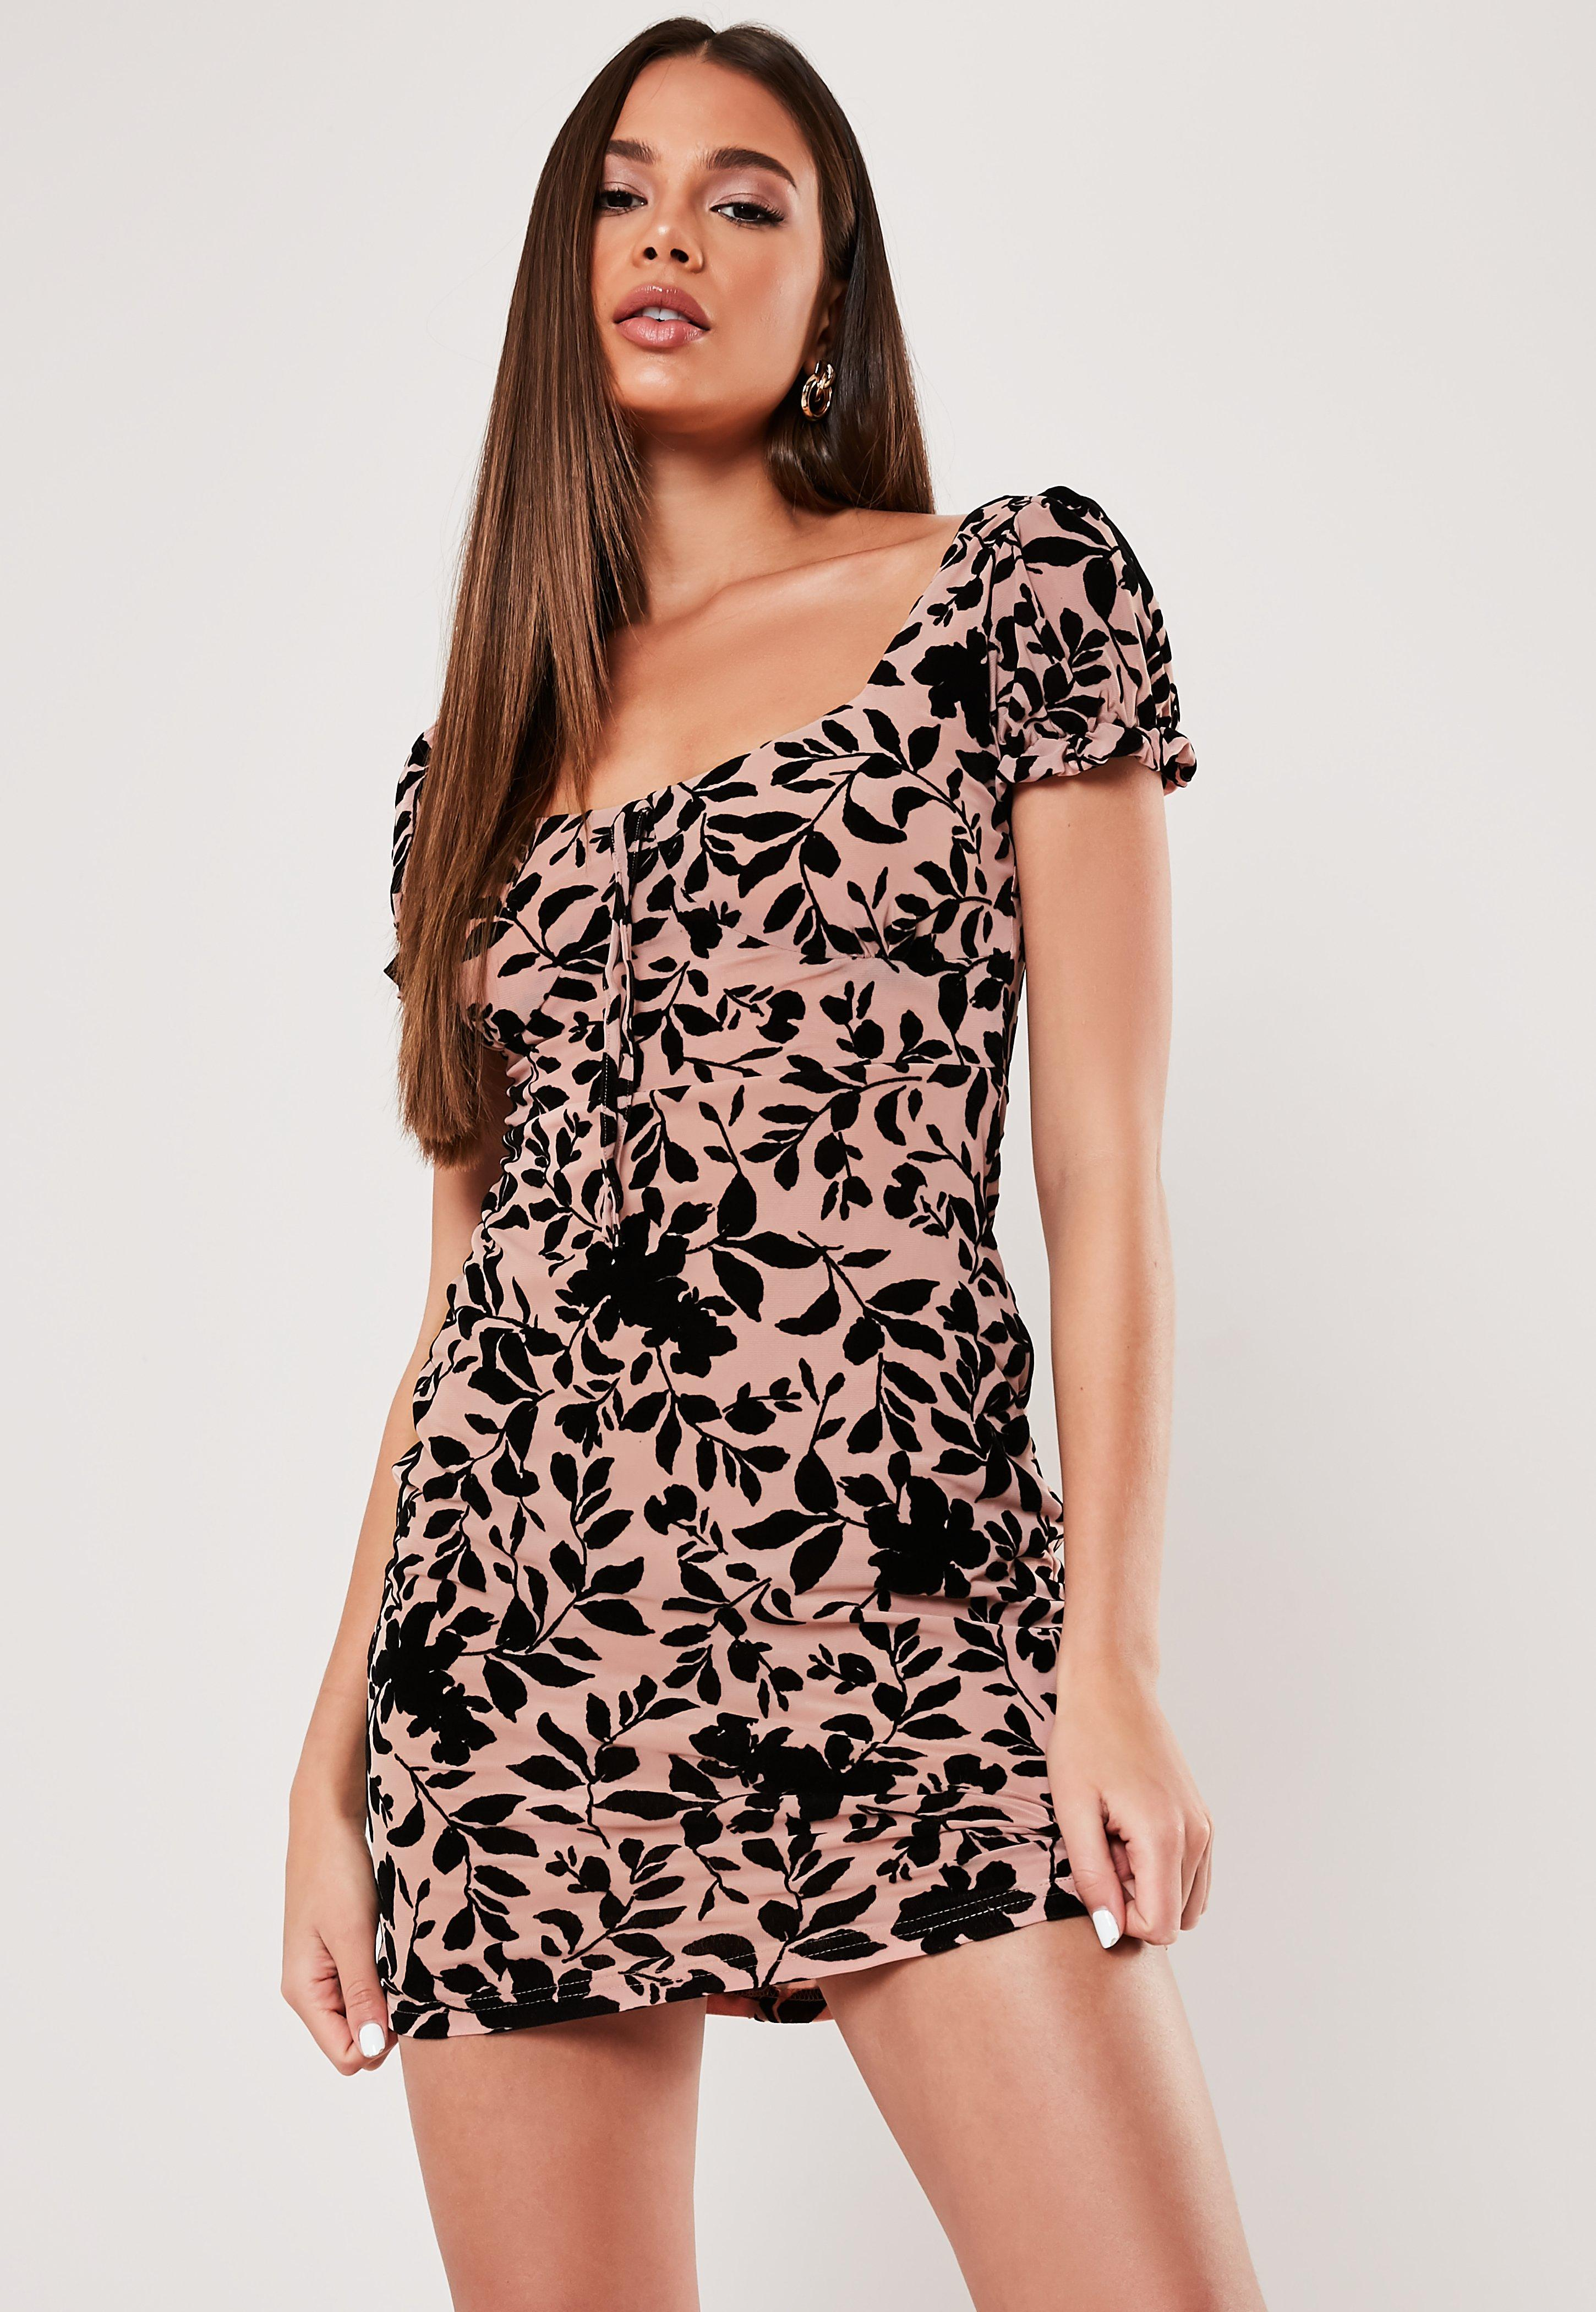 a0a81edfaf778 Floral Dresses   Flower Print Dresses - Missguided Australia